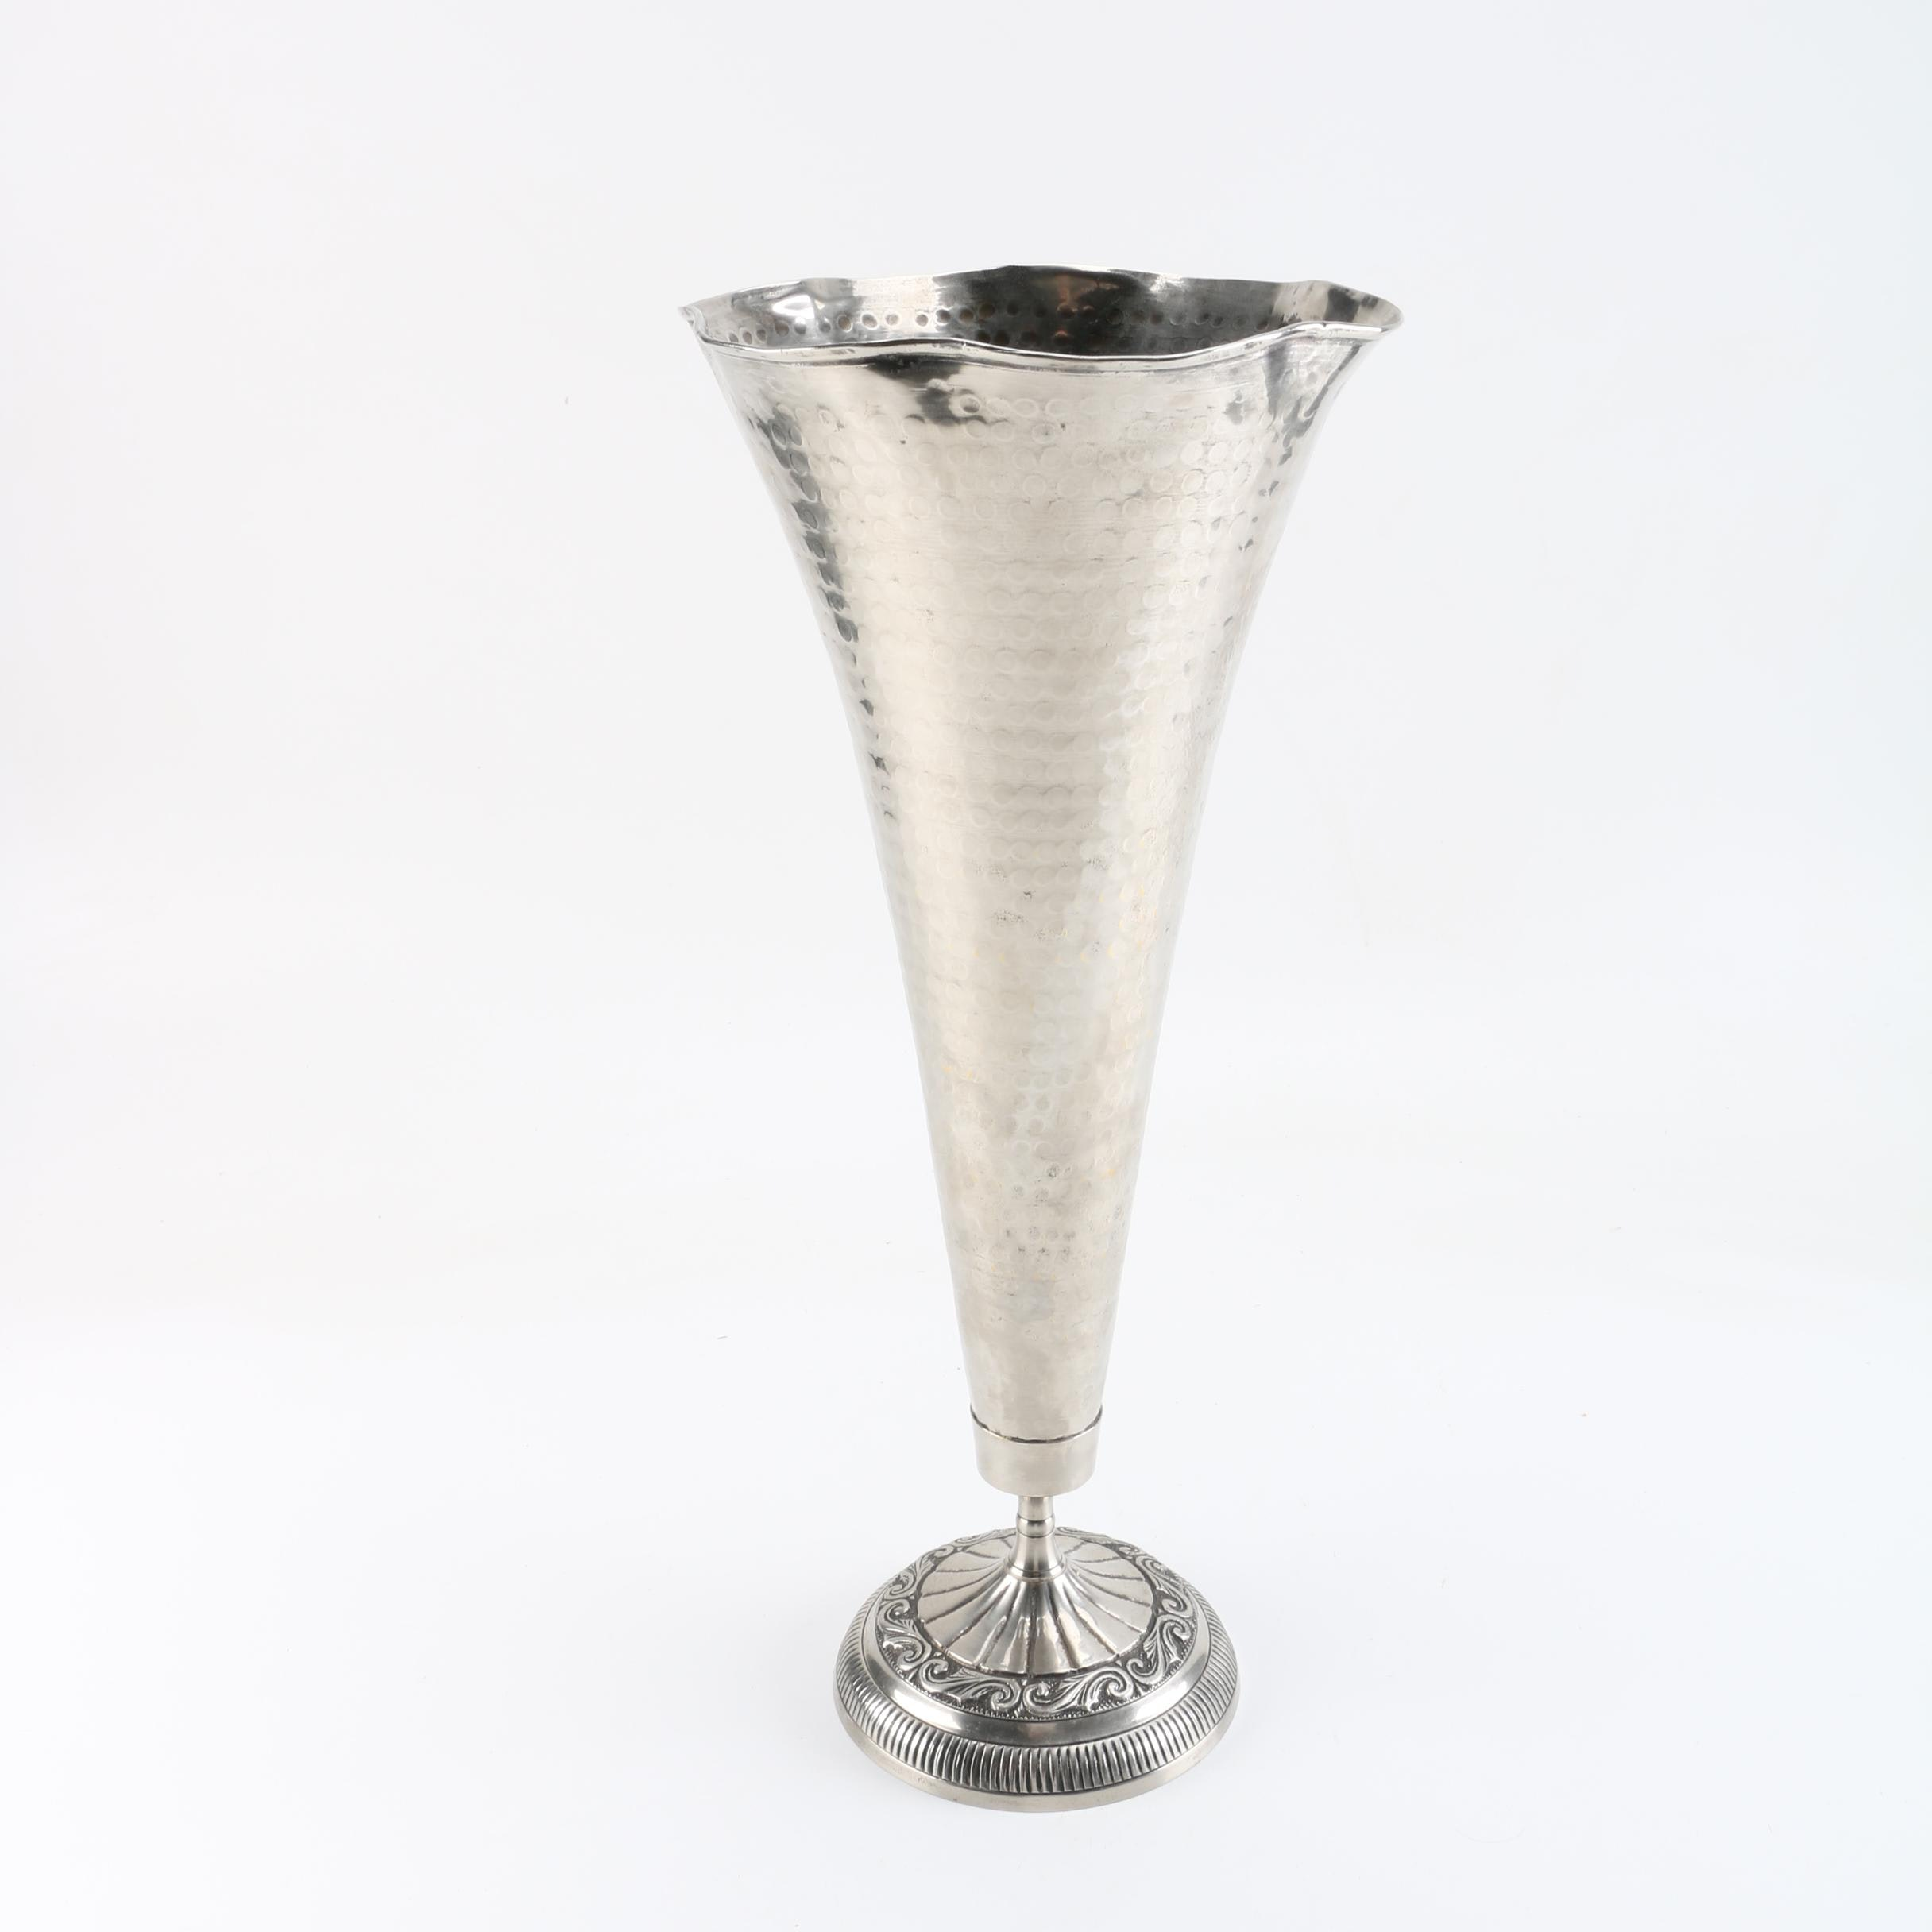 Hammered Silver-Plated Vase